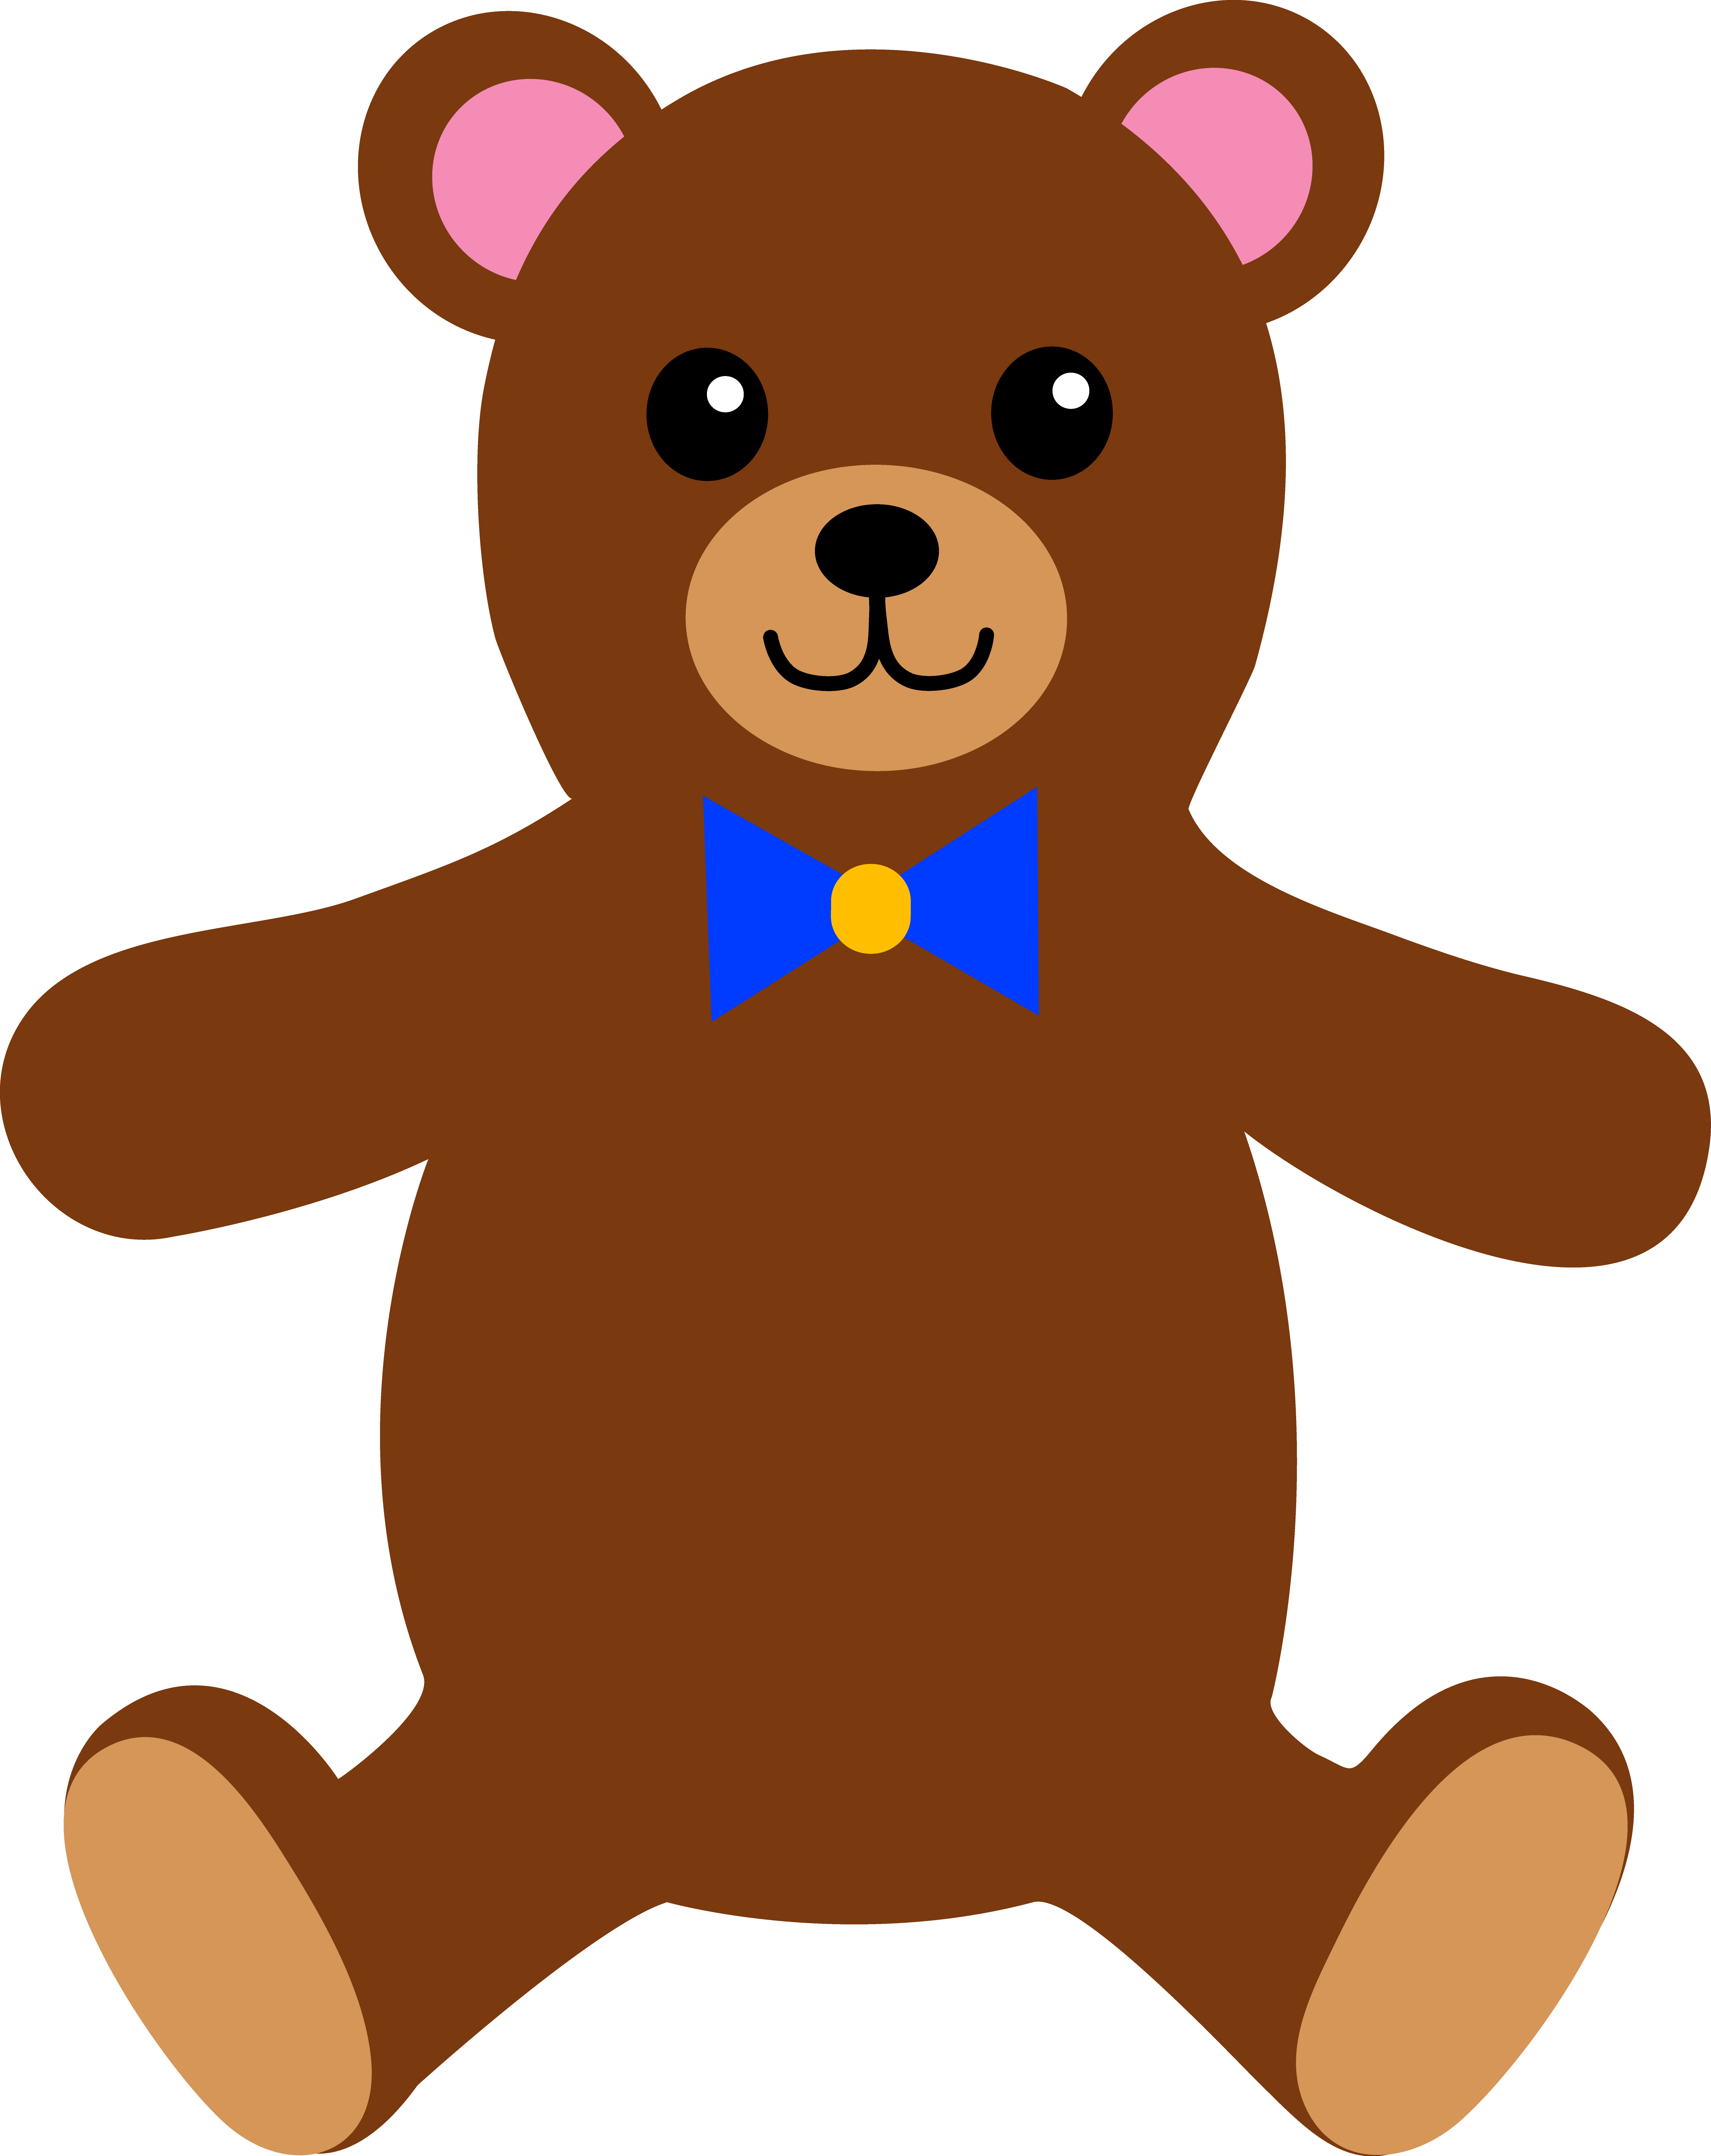 banner free library Childrens Stuffed Teddy Bear